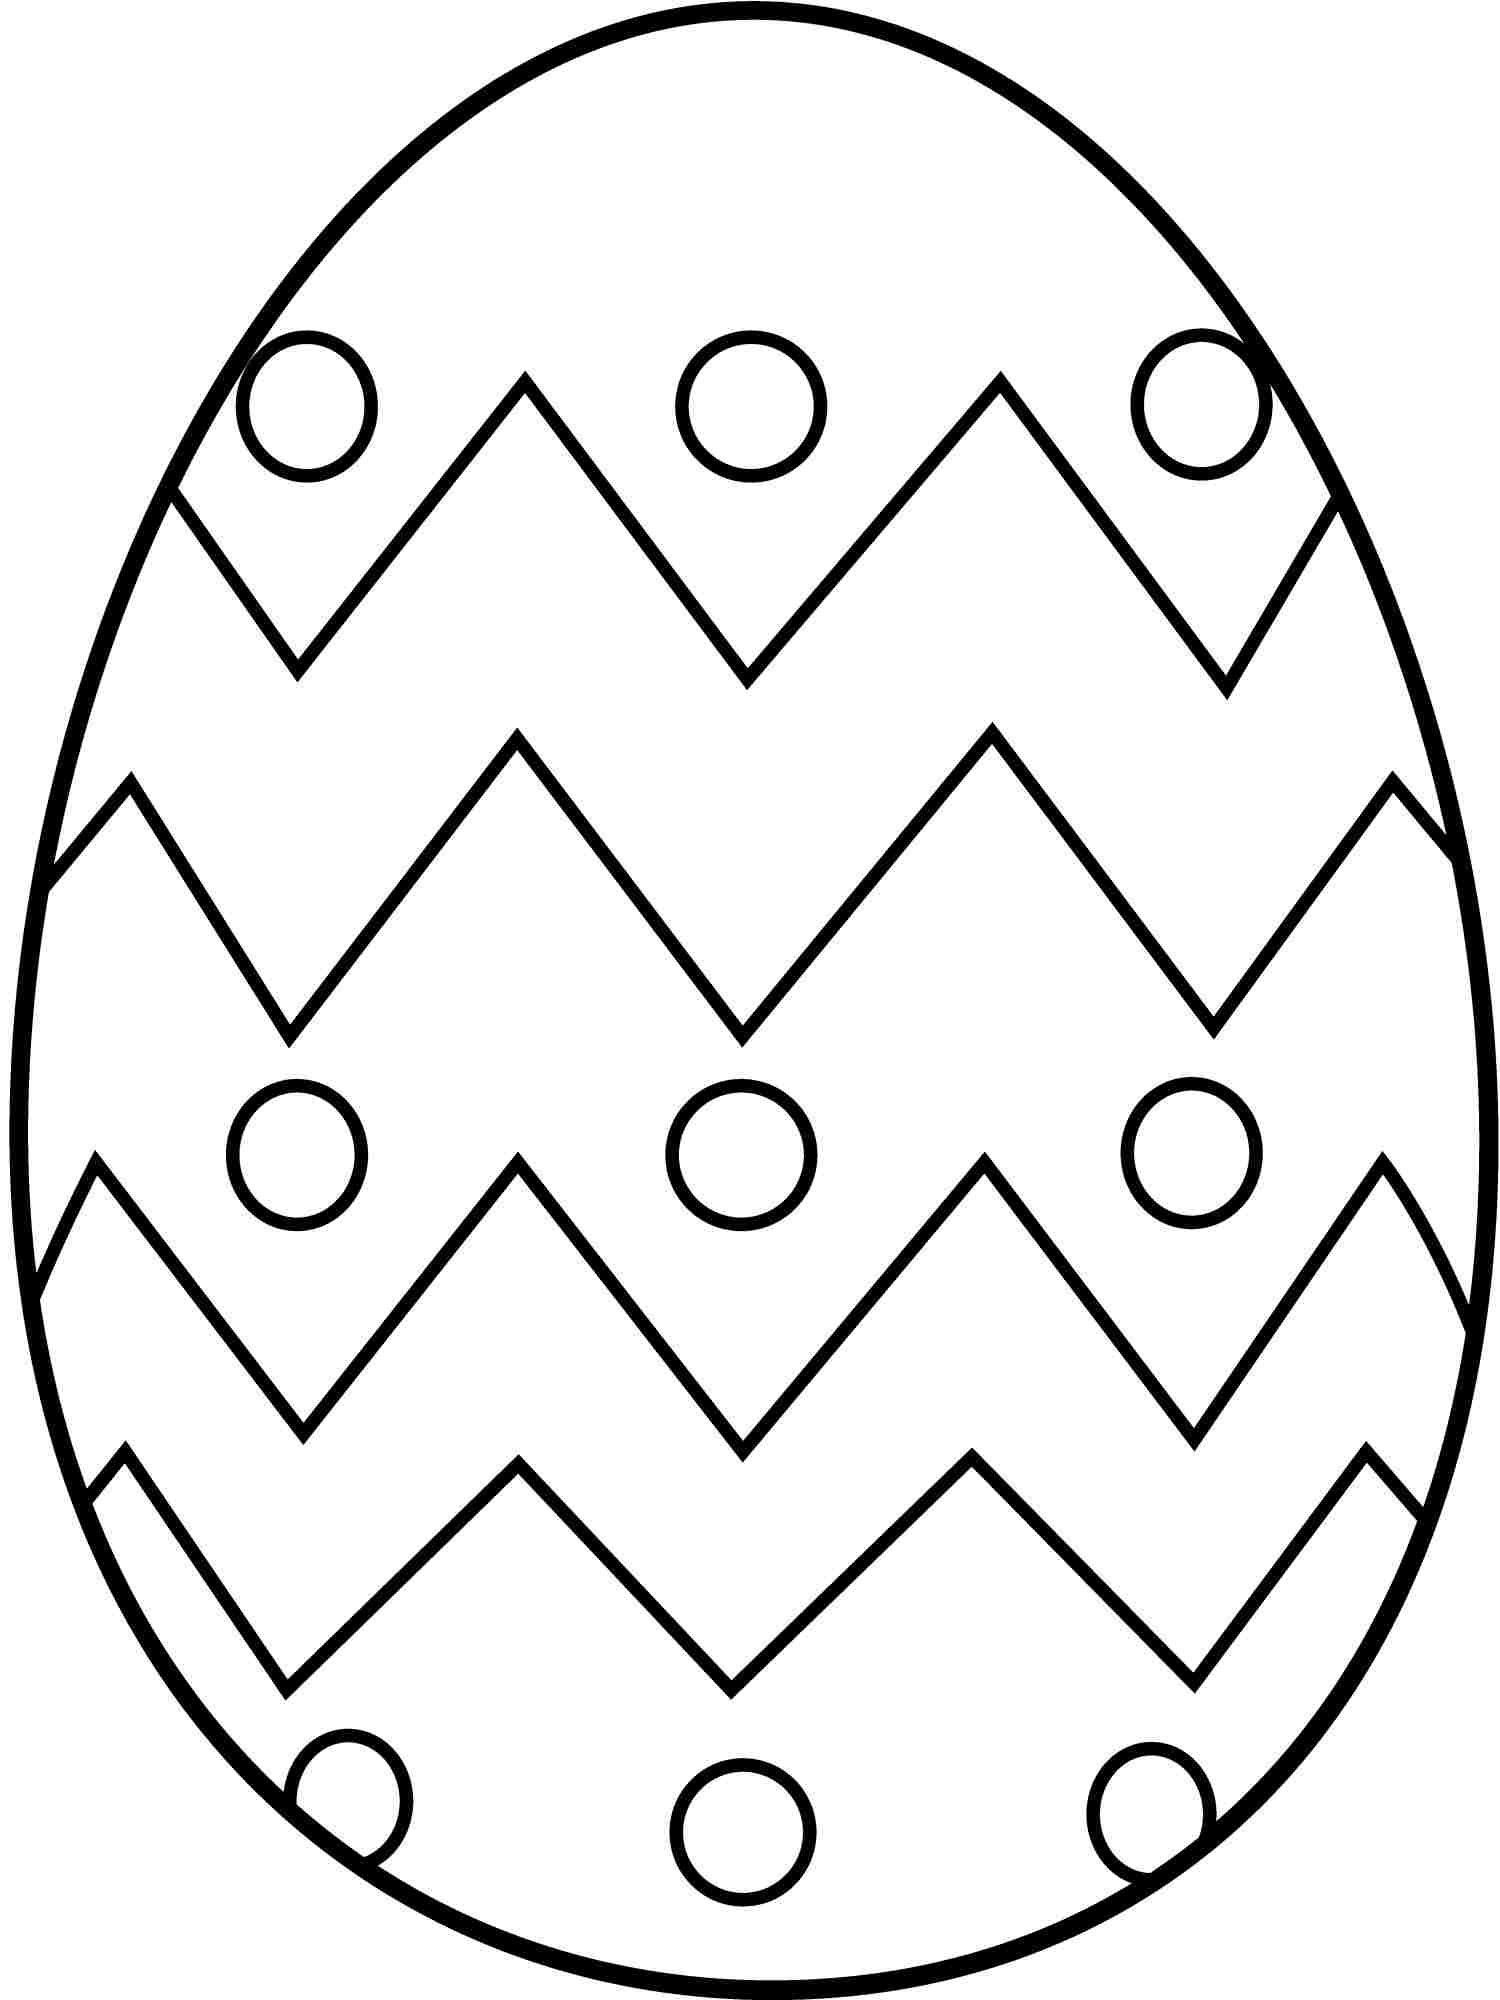 Http Www Zeofire Com Wp Content Uploads 2014 01 253 Easter Egg Coloring Pages Easter Coloring Pages Printable Easter Egg Pictures Free Easter Coloring Pages